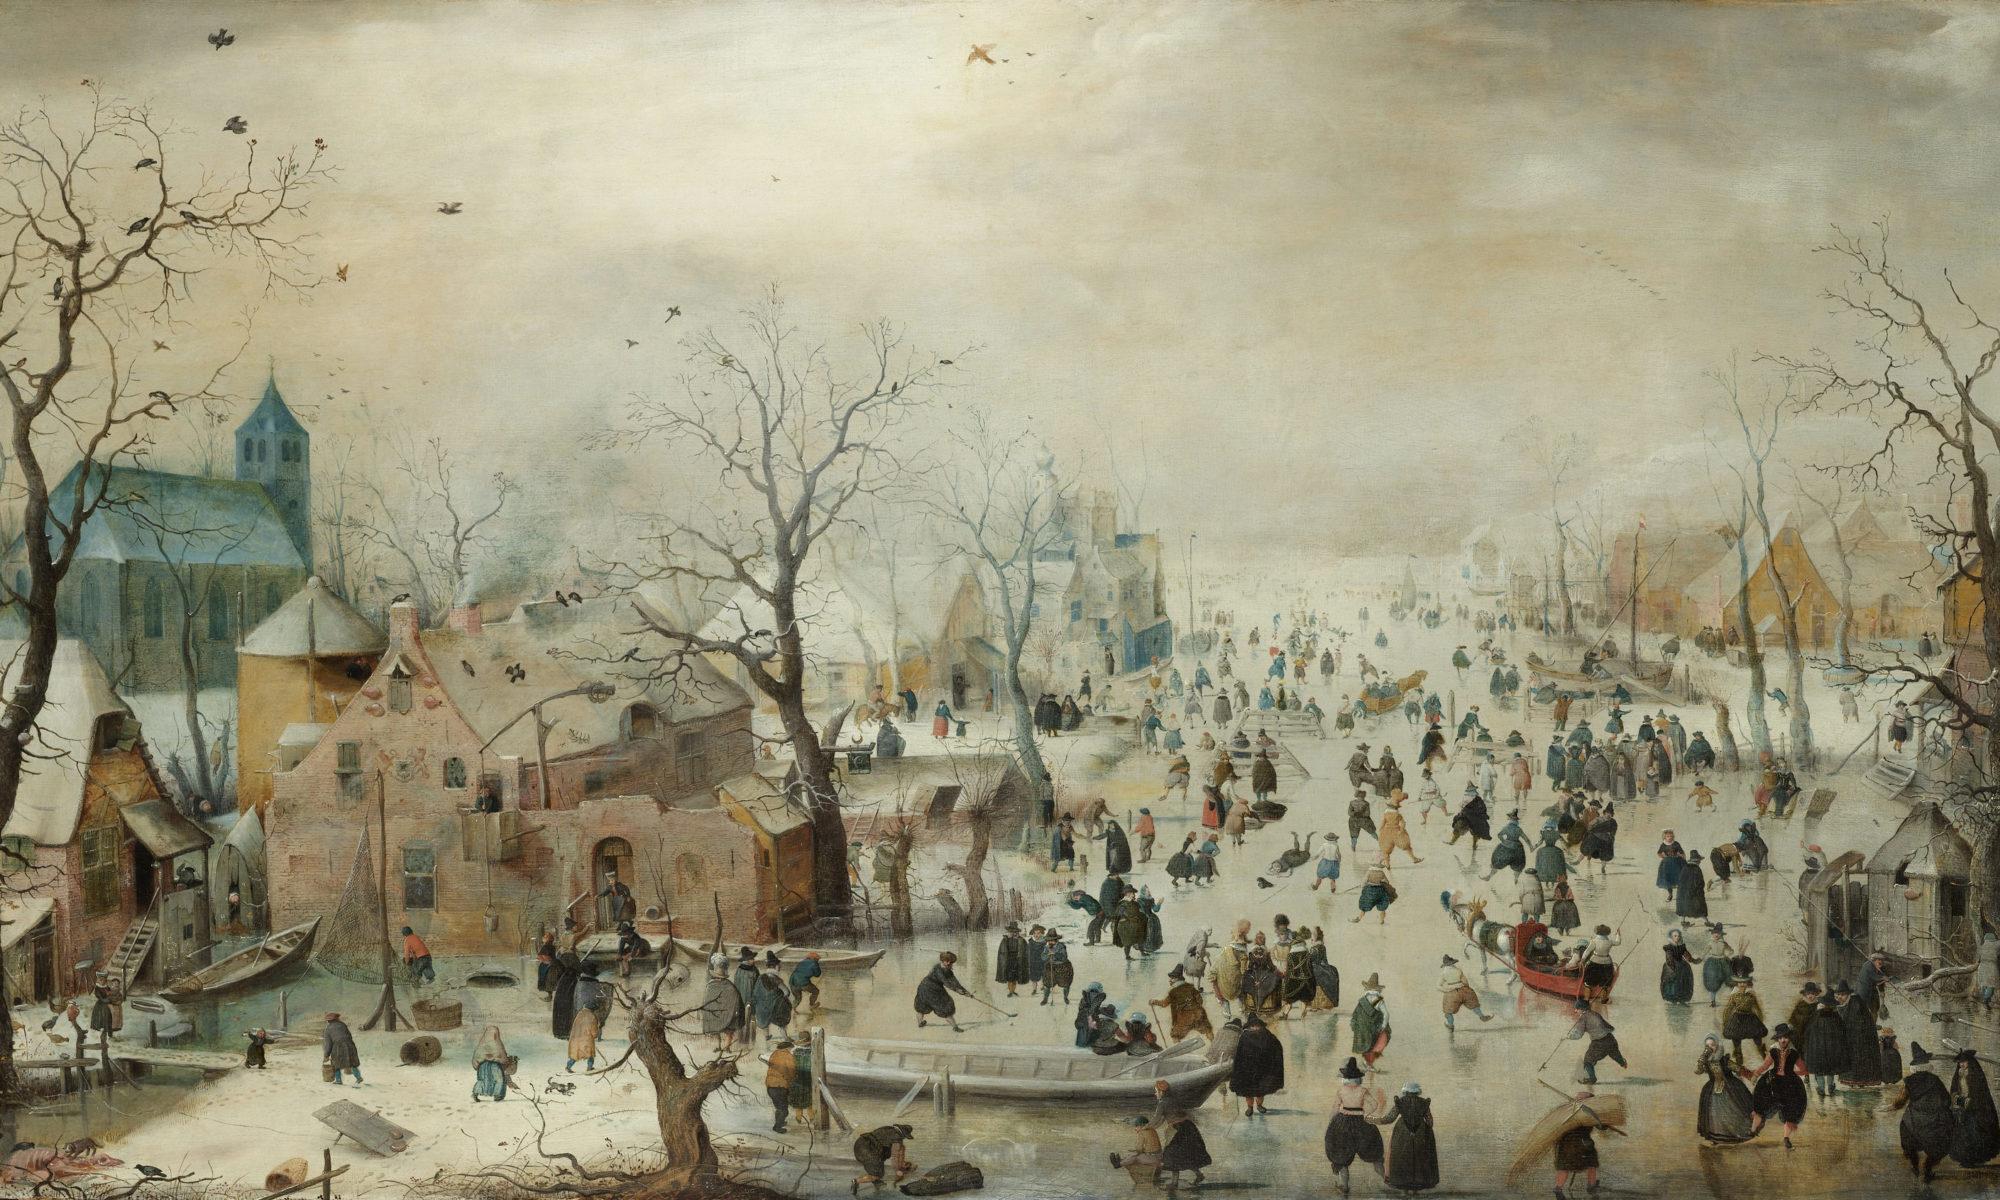 Winter Landscape with Ice Skaters (Hendrick Avercamp)